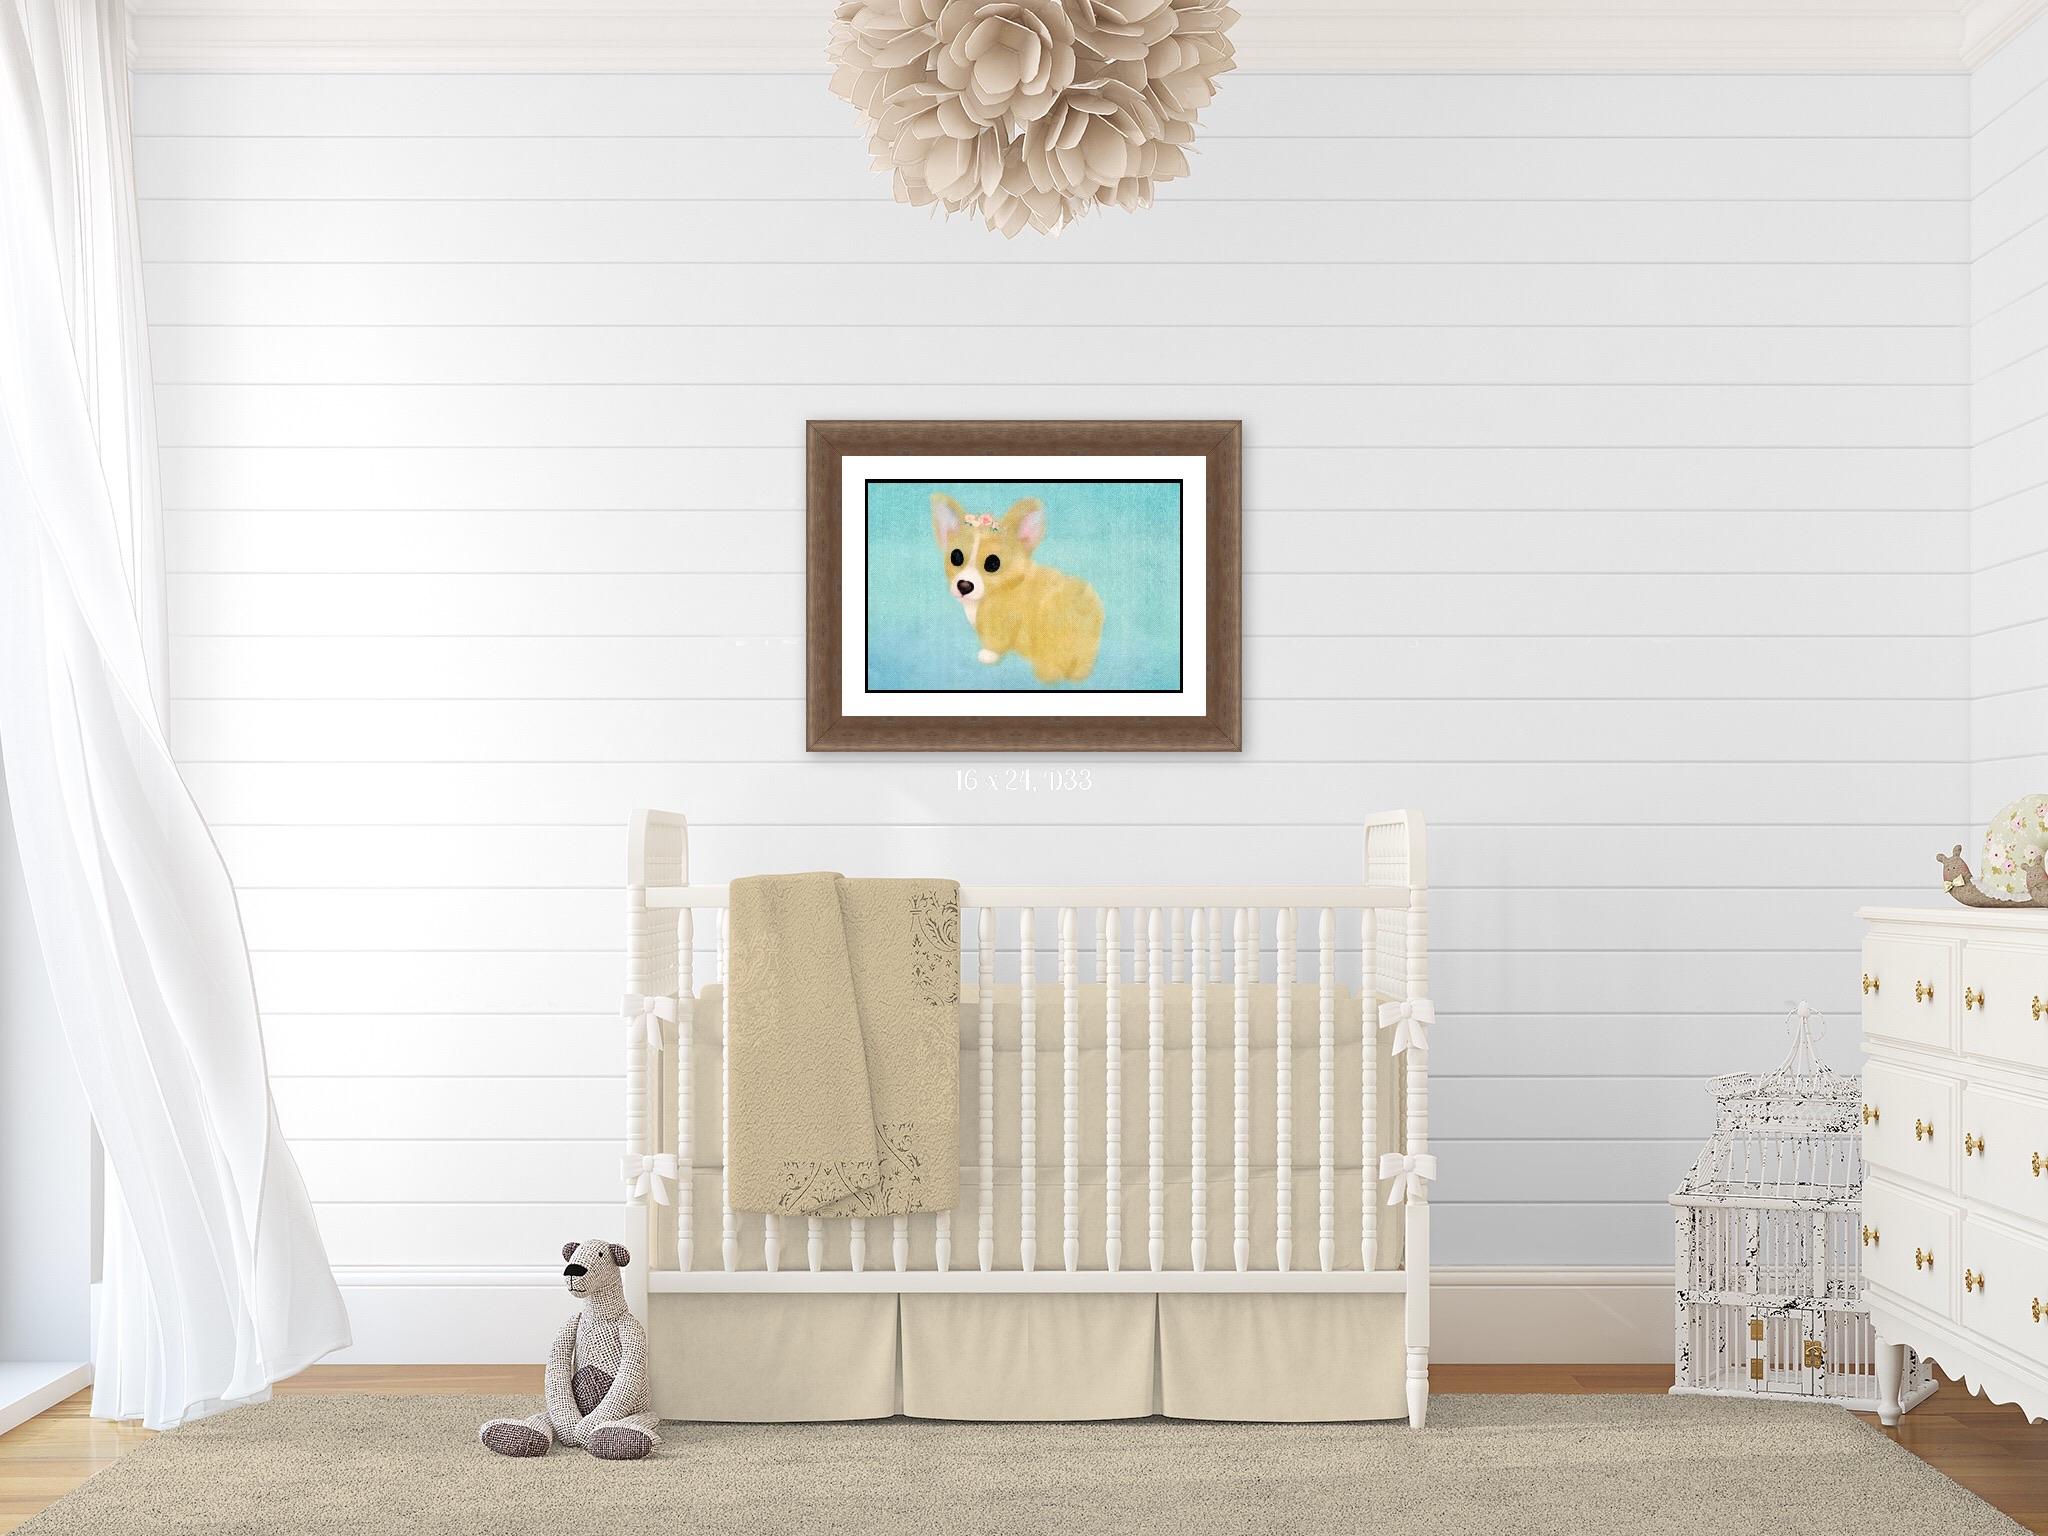 Buy Corgi Nursery Wall Art